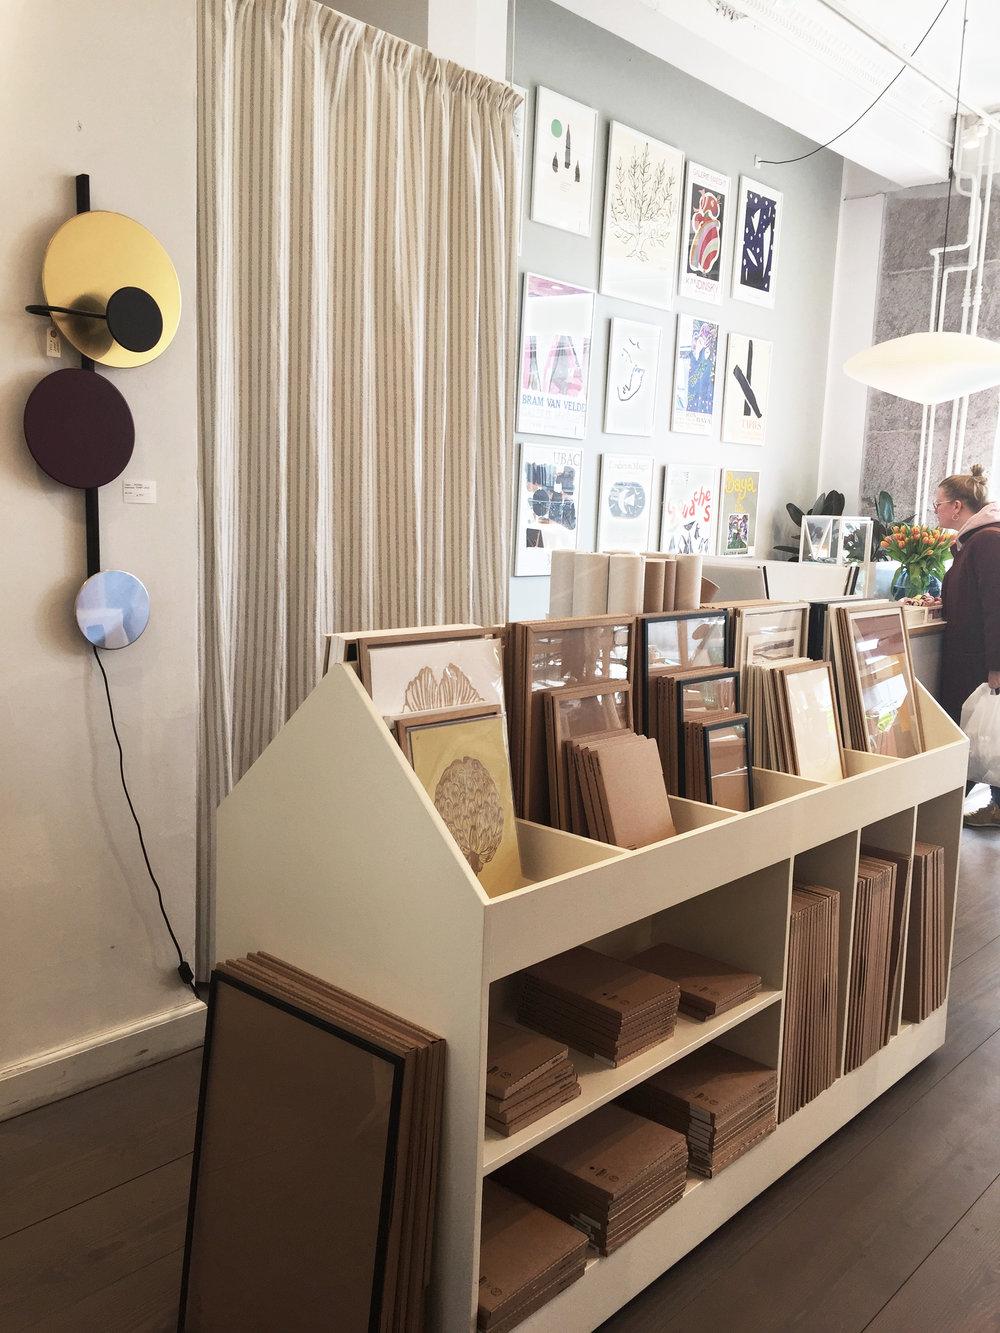 StudioGabrielle_Guide_Copenhagen_StylistEye_Stilleben